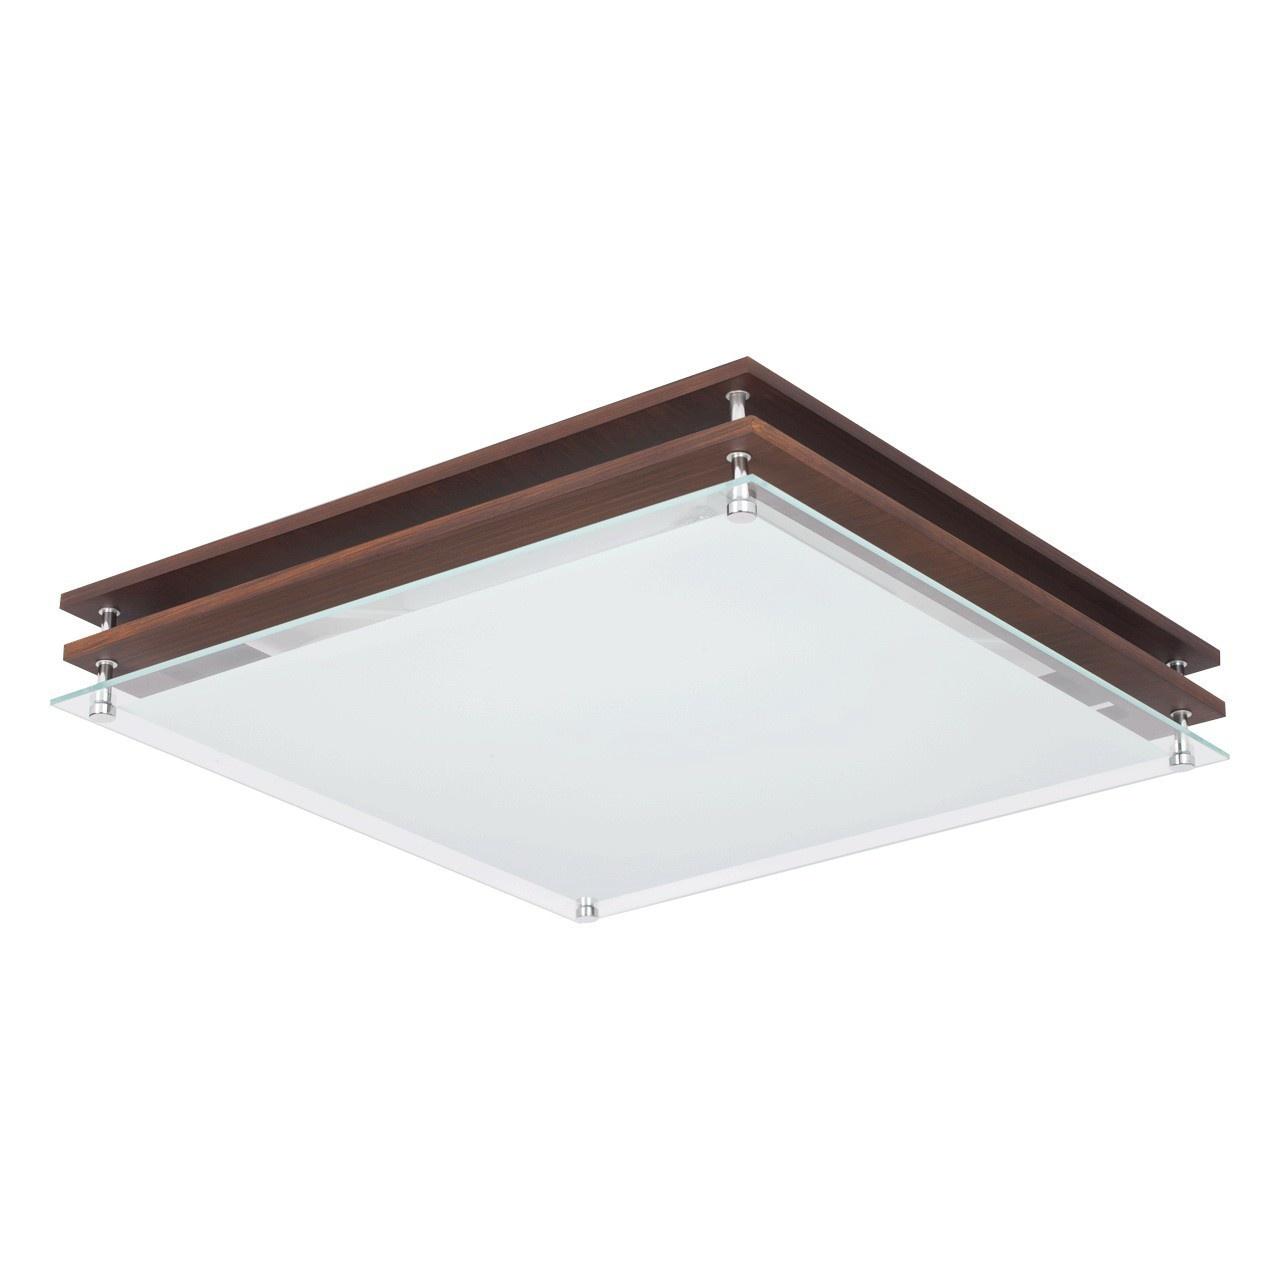 Люстра Mw lightЛюстры<br>Назначение светильника: для комнаты,<br>Стиль светильника: модерн,<br>Тип: потолочная,<br>Материал светильника: металл, стекло, мдф,<br>Материал плафона: стекло, мдф,<br>Материал арматуры: металл,<br>Длина (мм): 470,<br>Ширина: 470,<br>Высота: 100,<br>Количество ламп: 6,<br>Тип лампы: накаливания,<br>Мощность: 60,<br>Патрон: Е14,<br>Цвет арматуры: хром,<br>Коллекция: Эдгар<br>